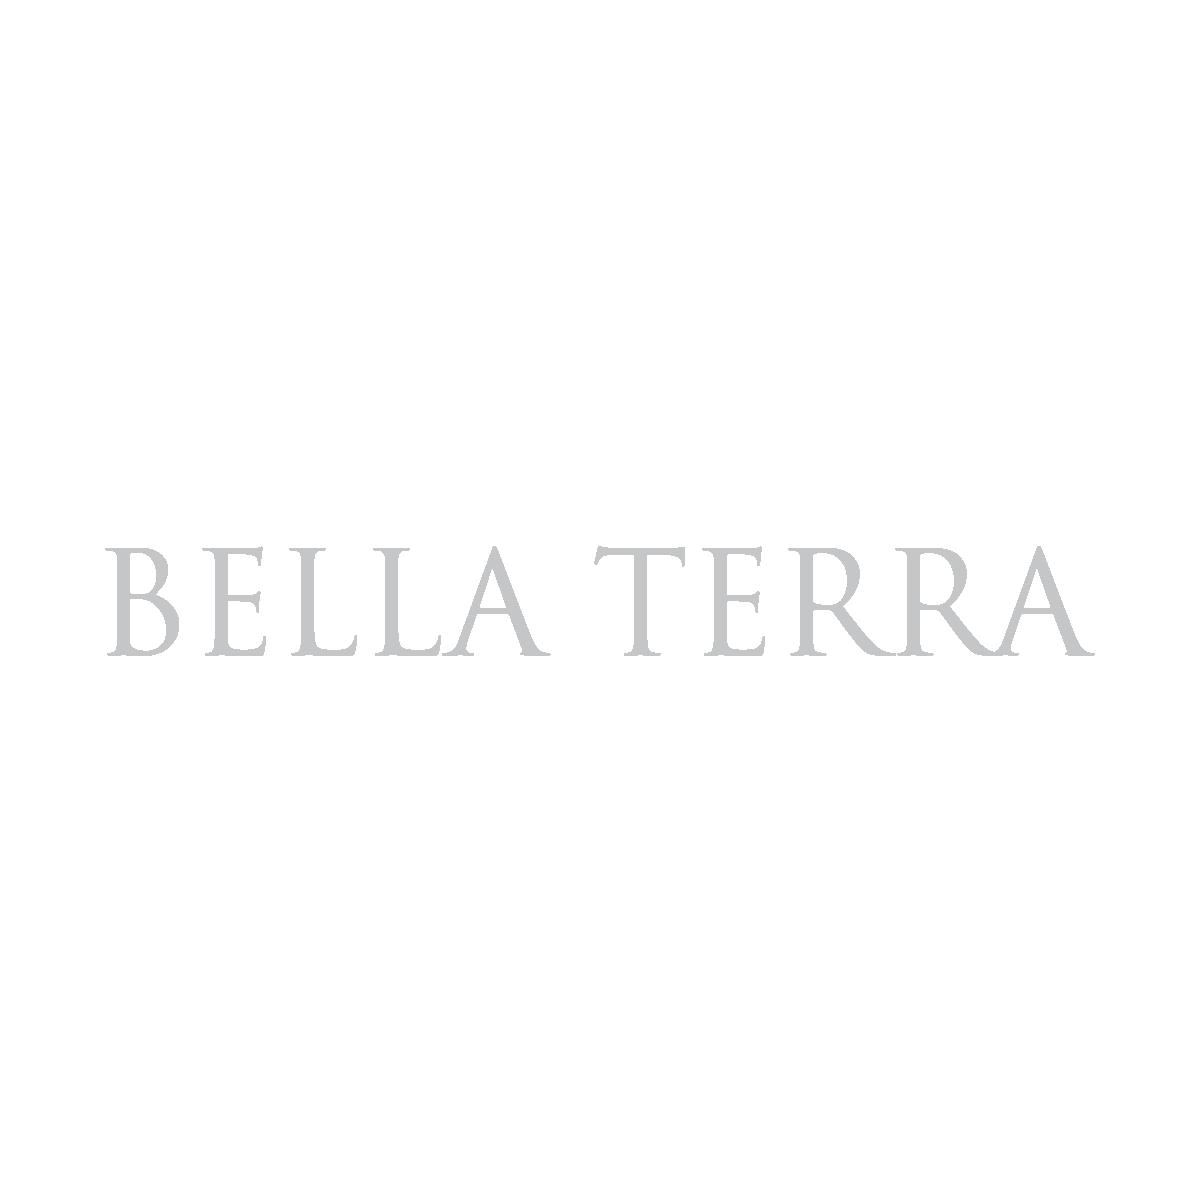 Bella Terra.png